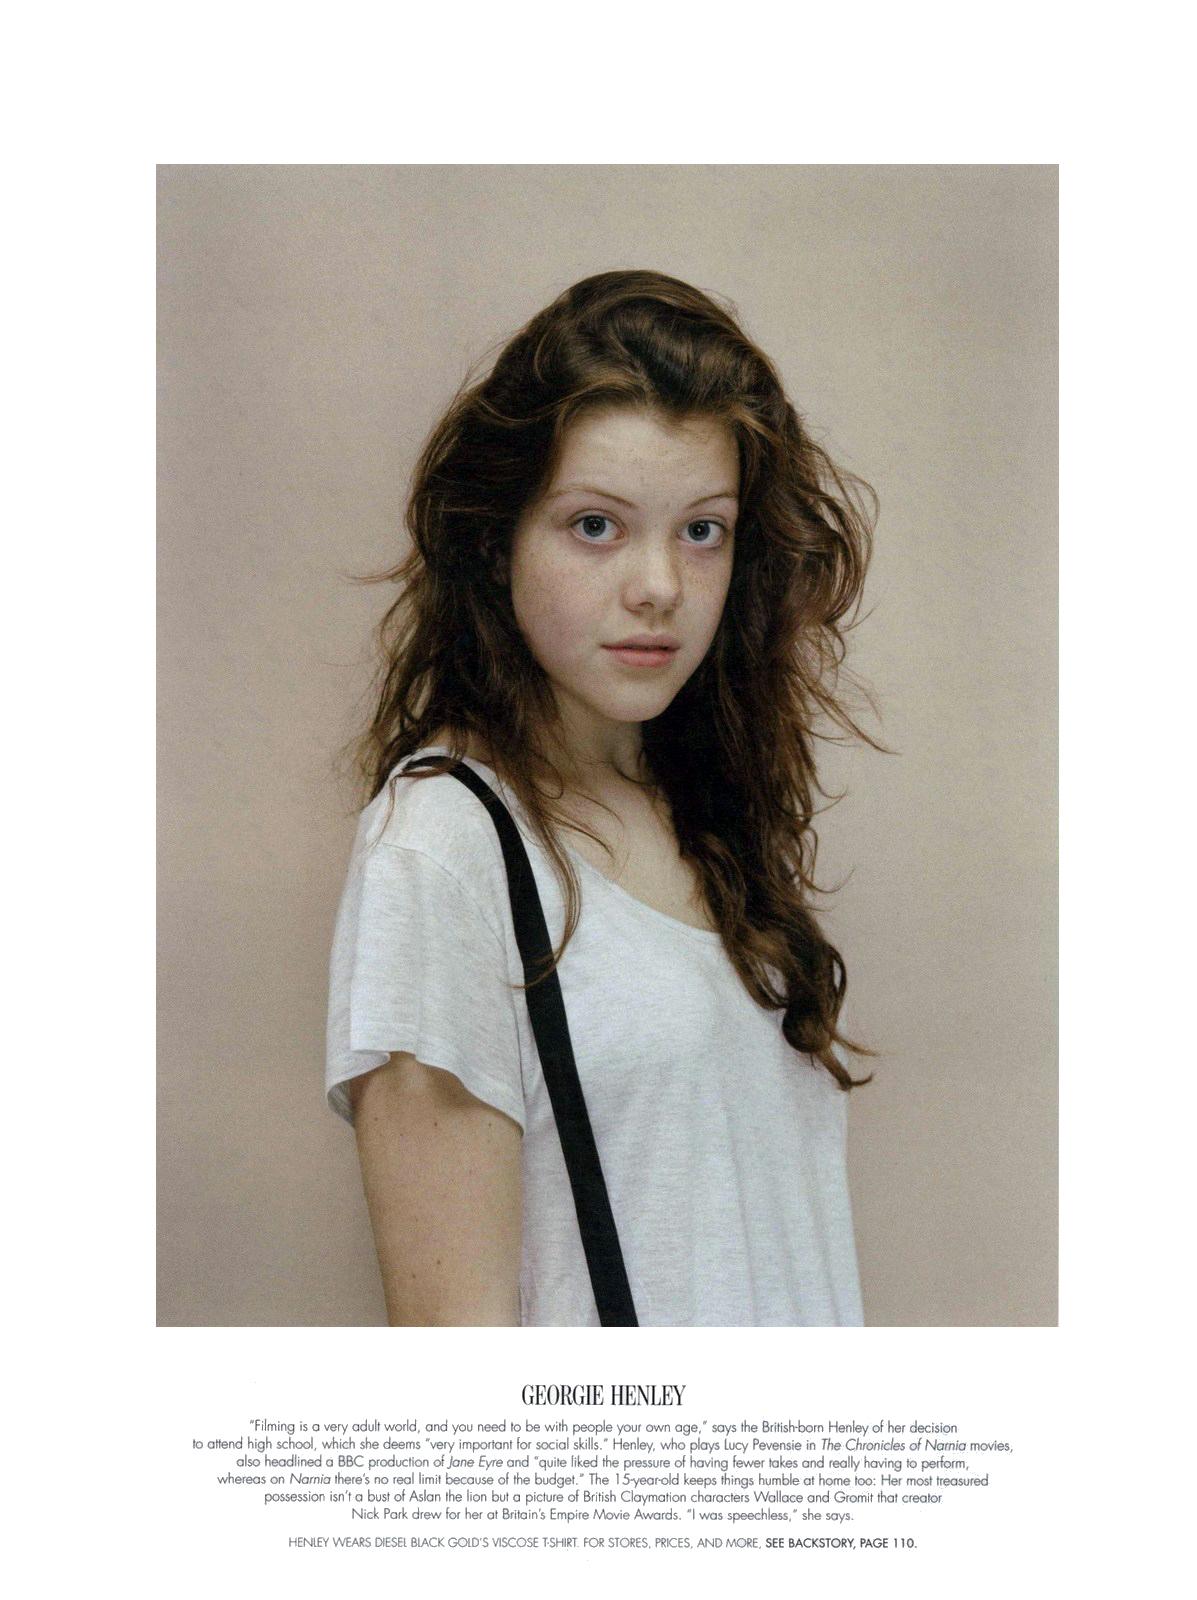 Georgie Henley - Wallpaper